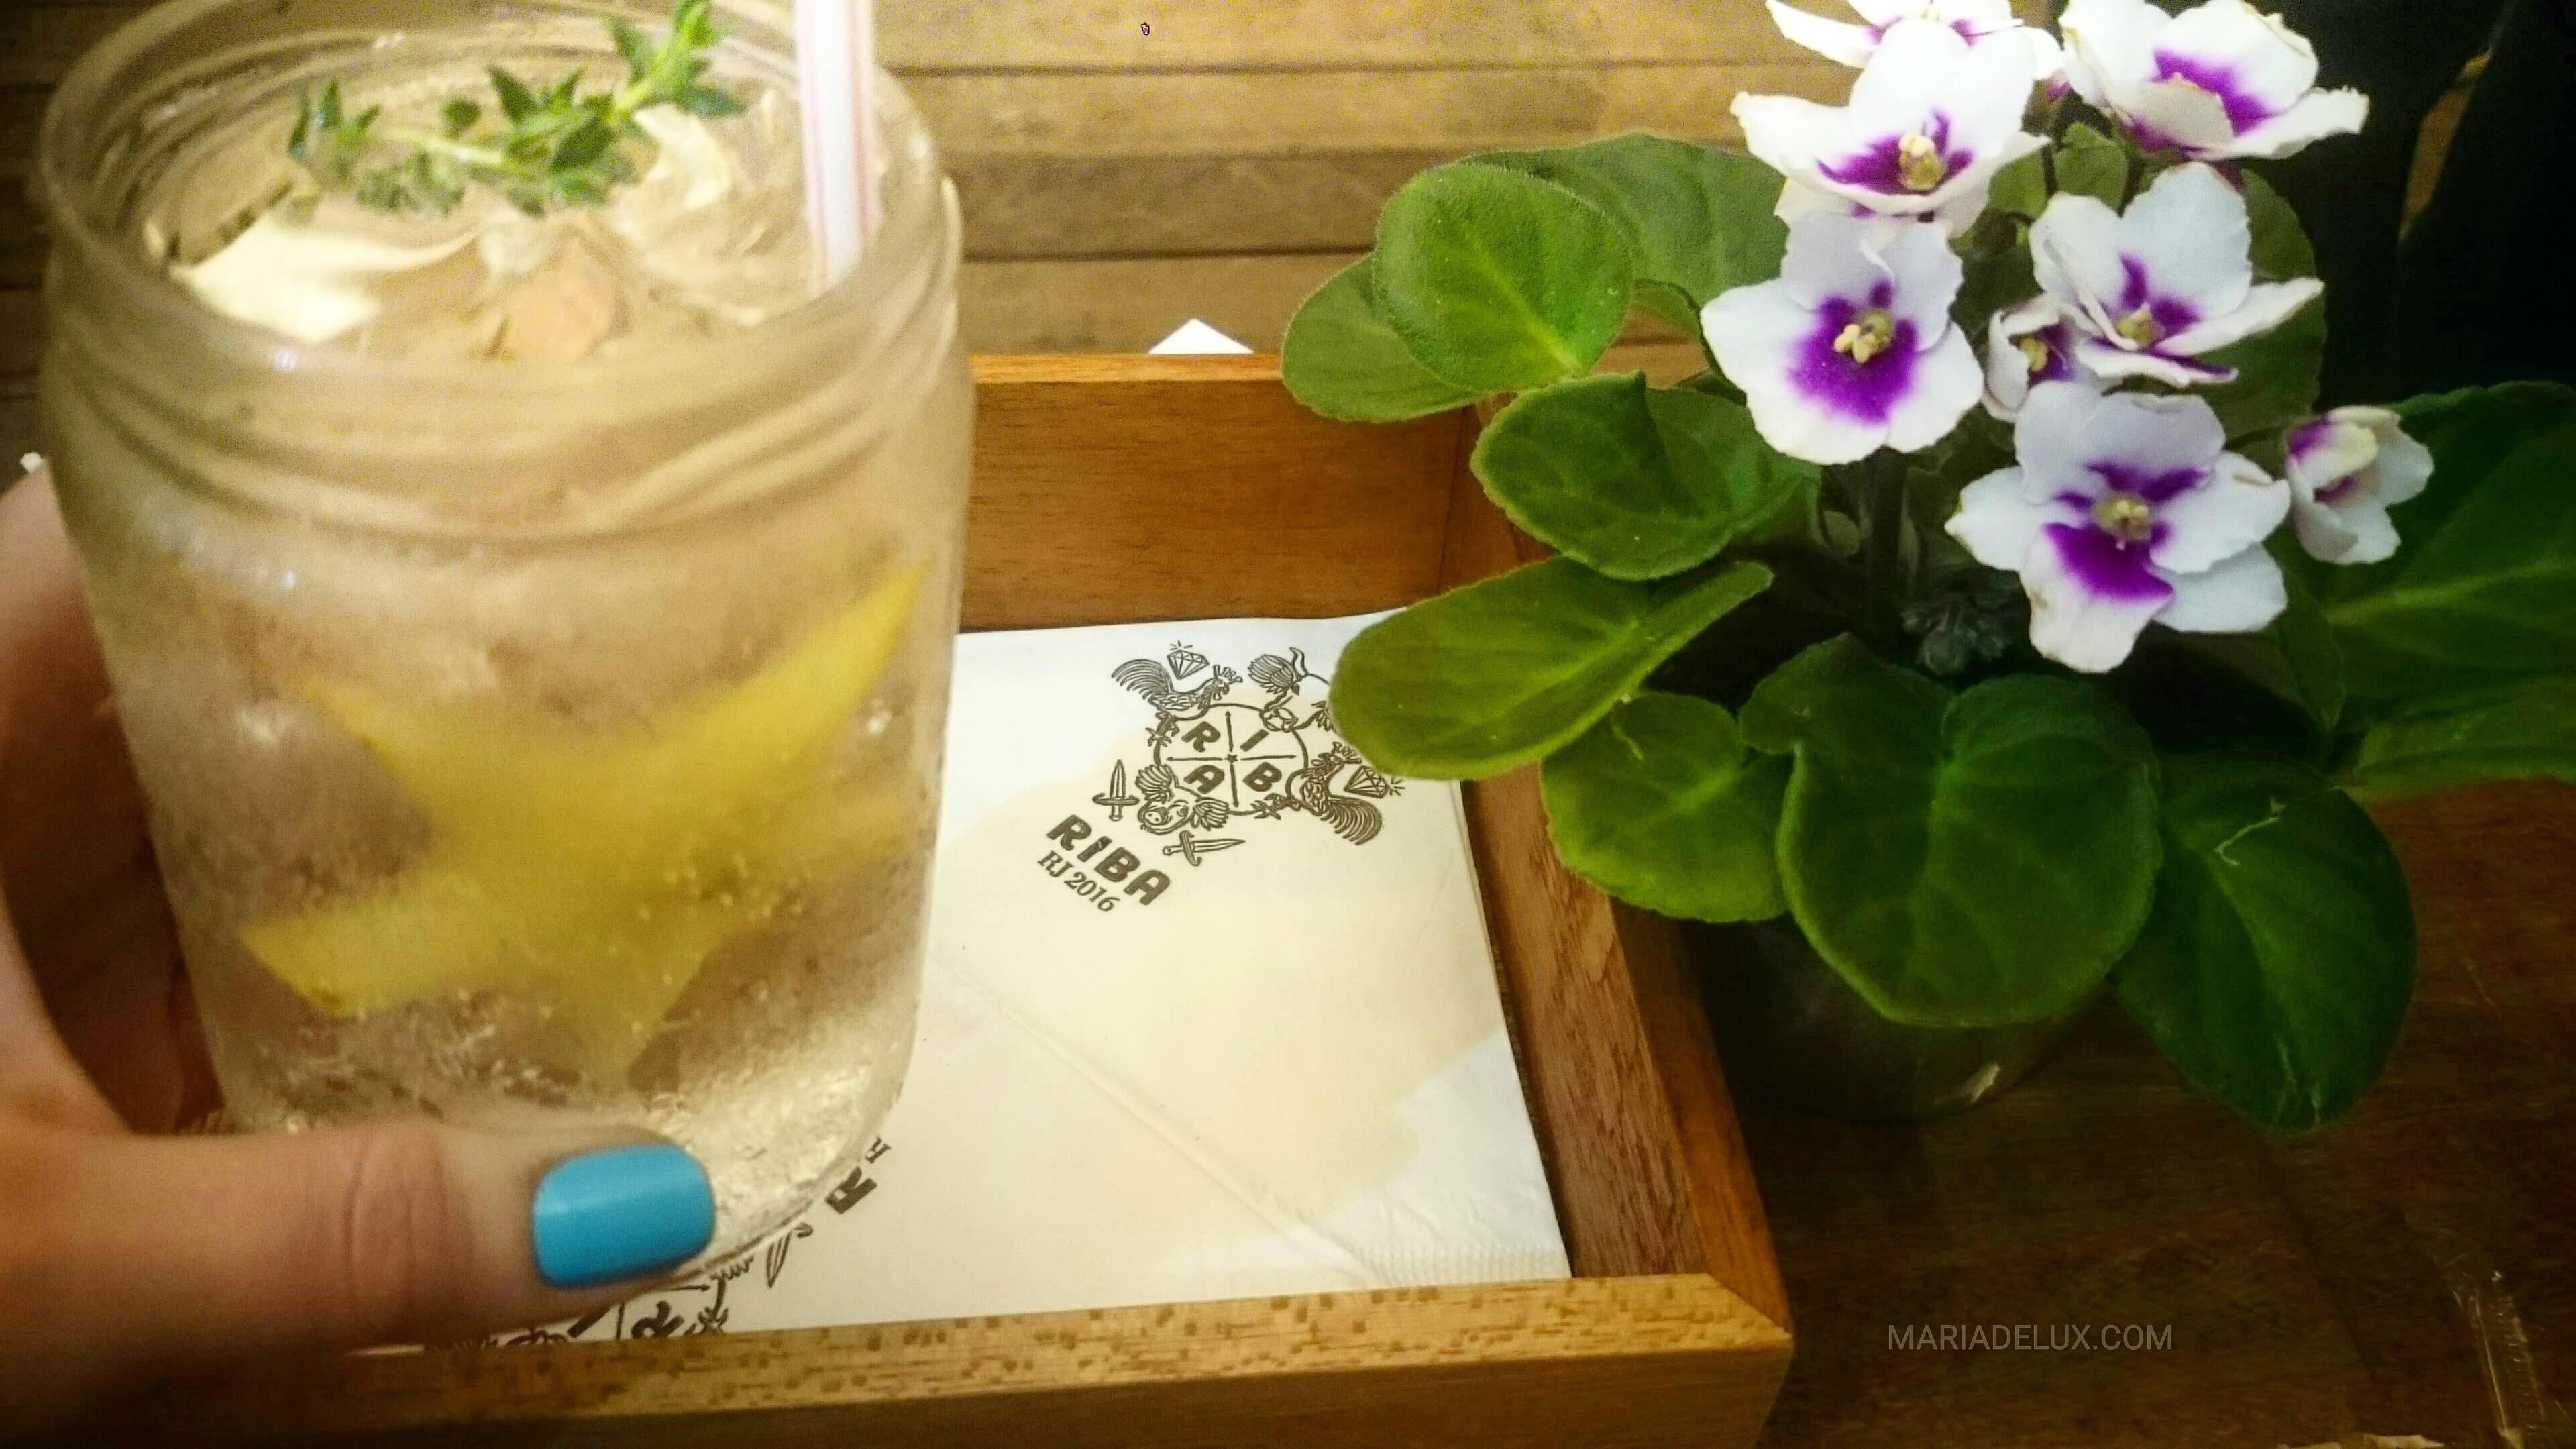 Gind & tonic com carambola no Ribas (Rio de Janeiro) | Gin and tonic with starfruit at Riba (Rio de Janeiro)